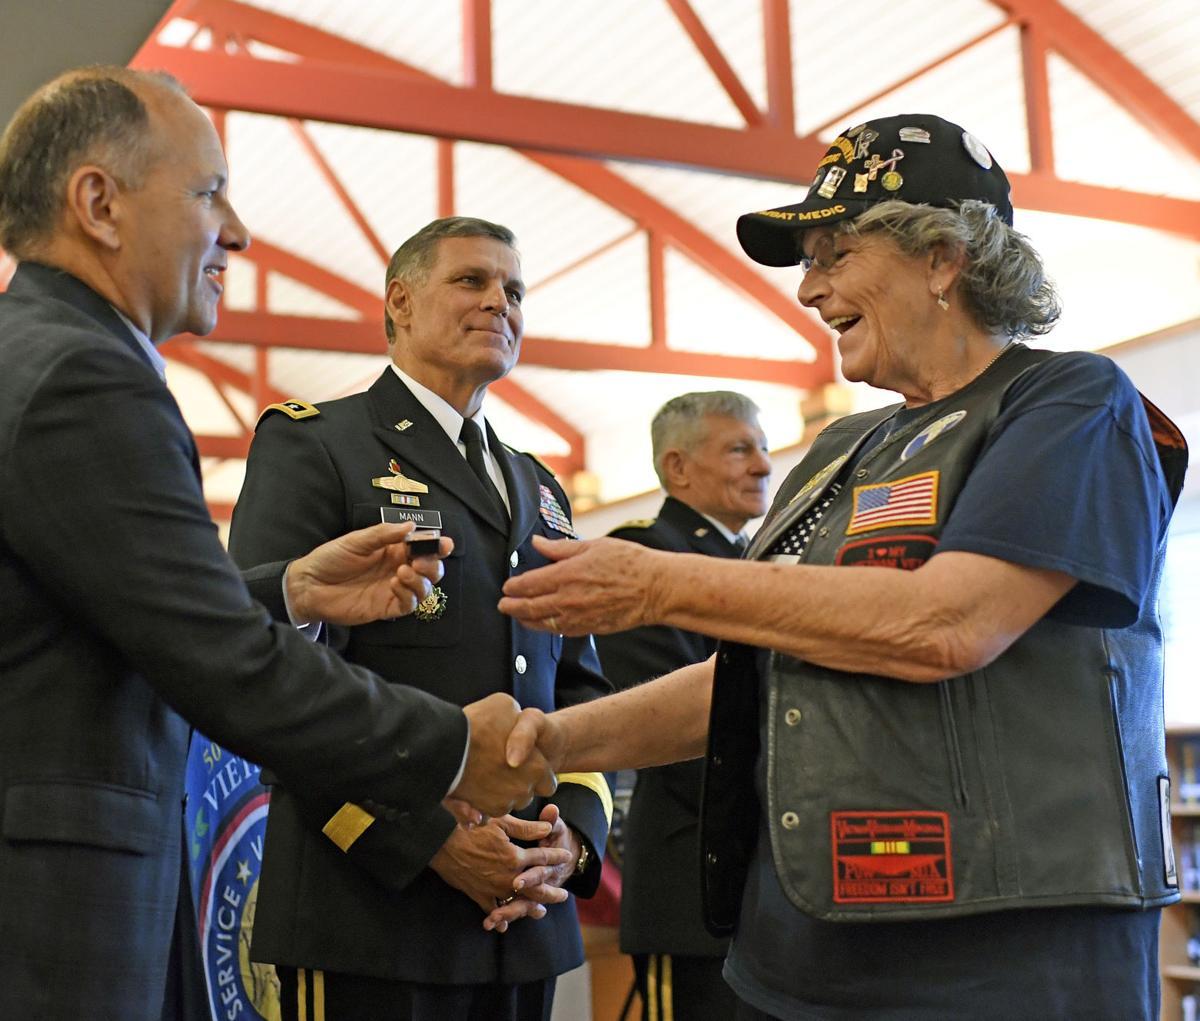 Rep. Lloyd Smucker Honors Vietnam Vets